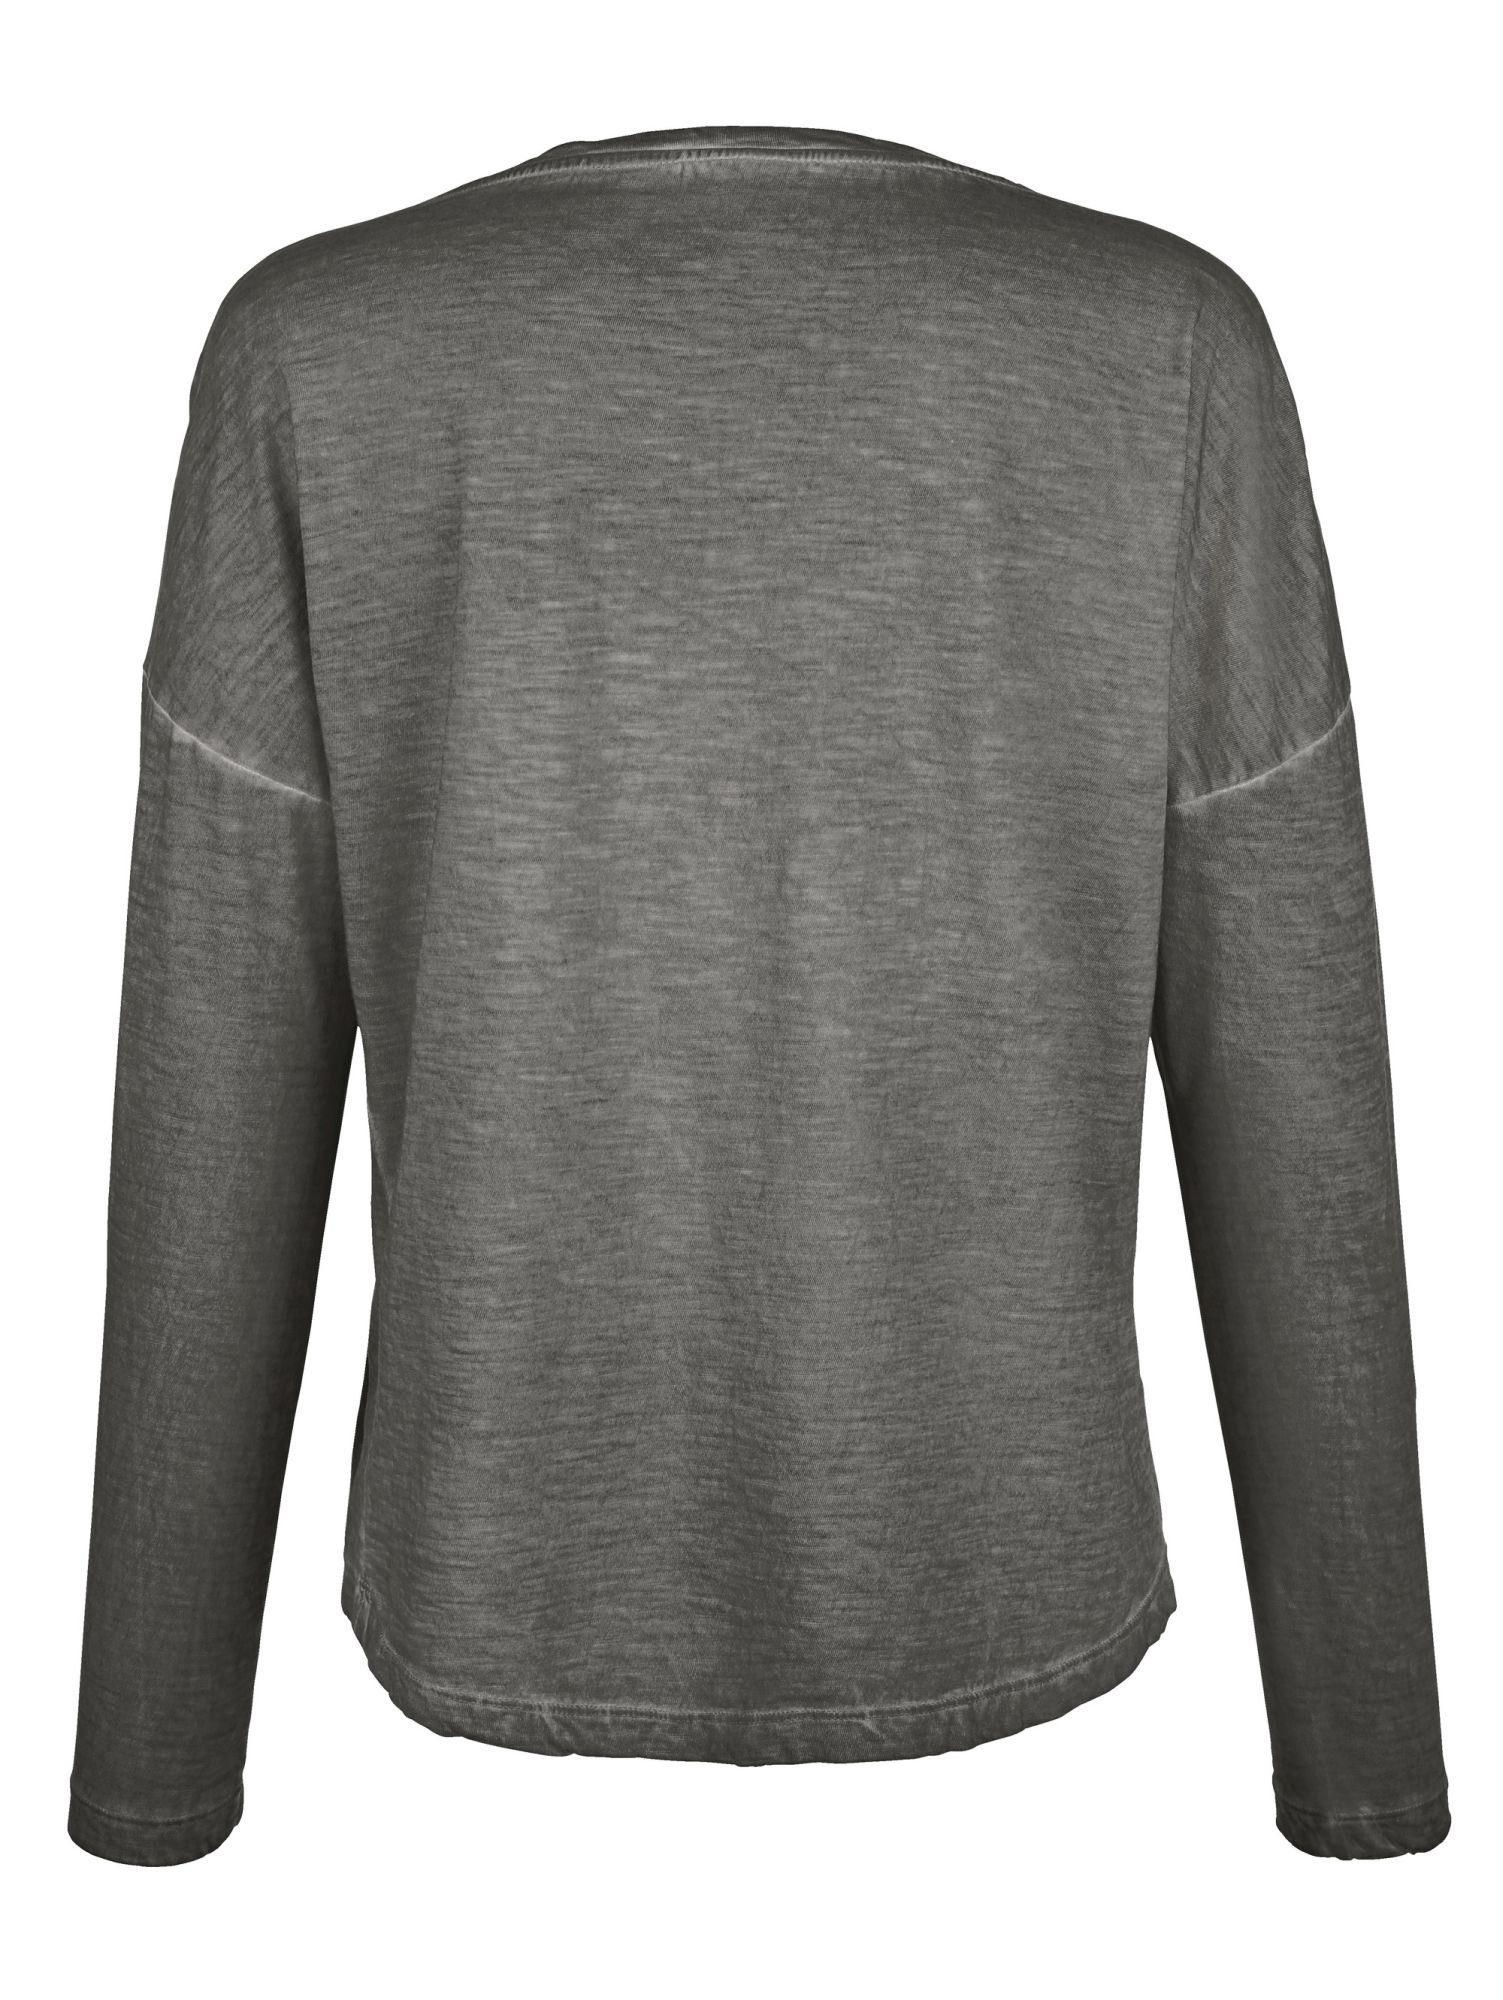 Eulenmotiv Mit Moda Alba Kaufen Online Shirt 9HED2IYW